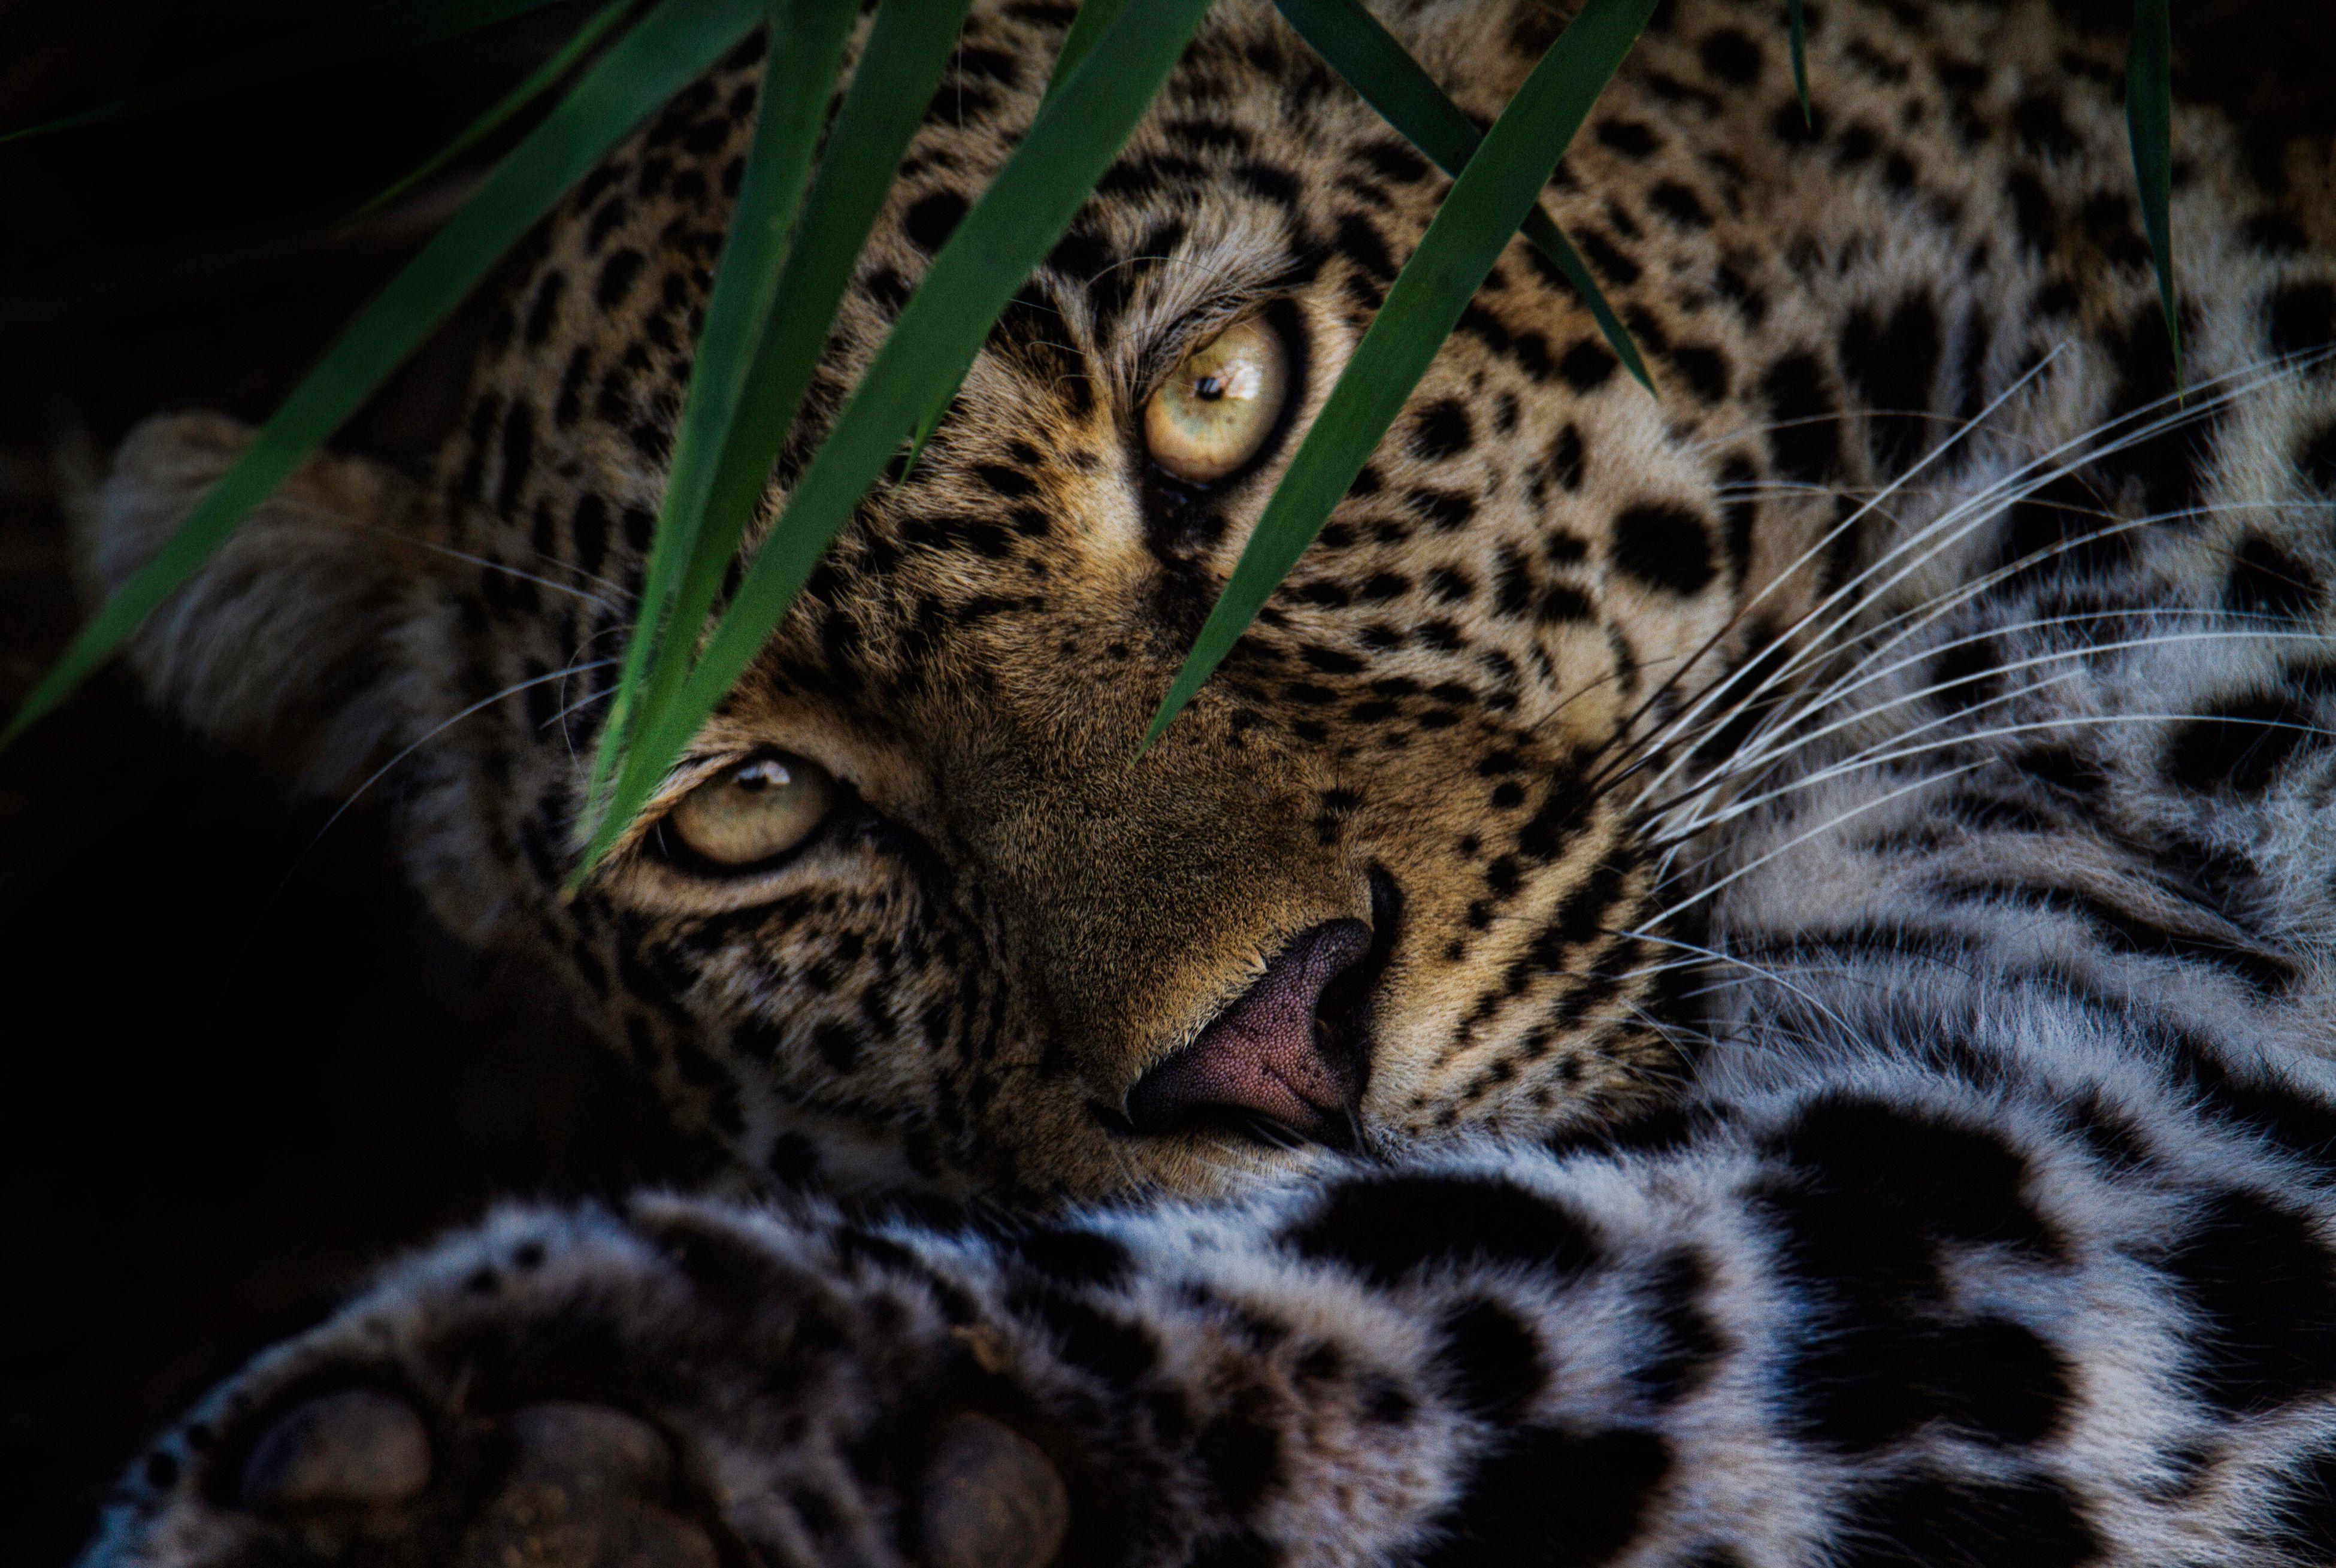 animal themes, one animal, mammal, feline, animal markings, wildlife, whisker, animals in the wild, tiger, close-up, animal head, domestic cat, cat, animal body part, lying down, natural pattern, relaxation, safari animals, big cat, undomesticated cat